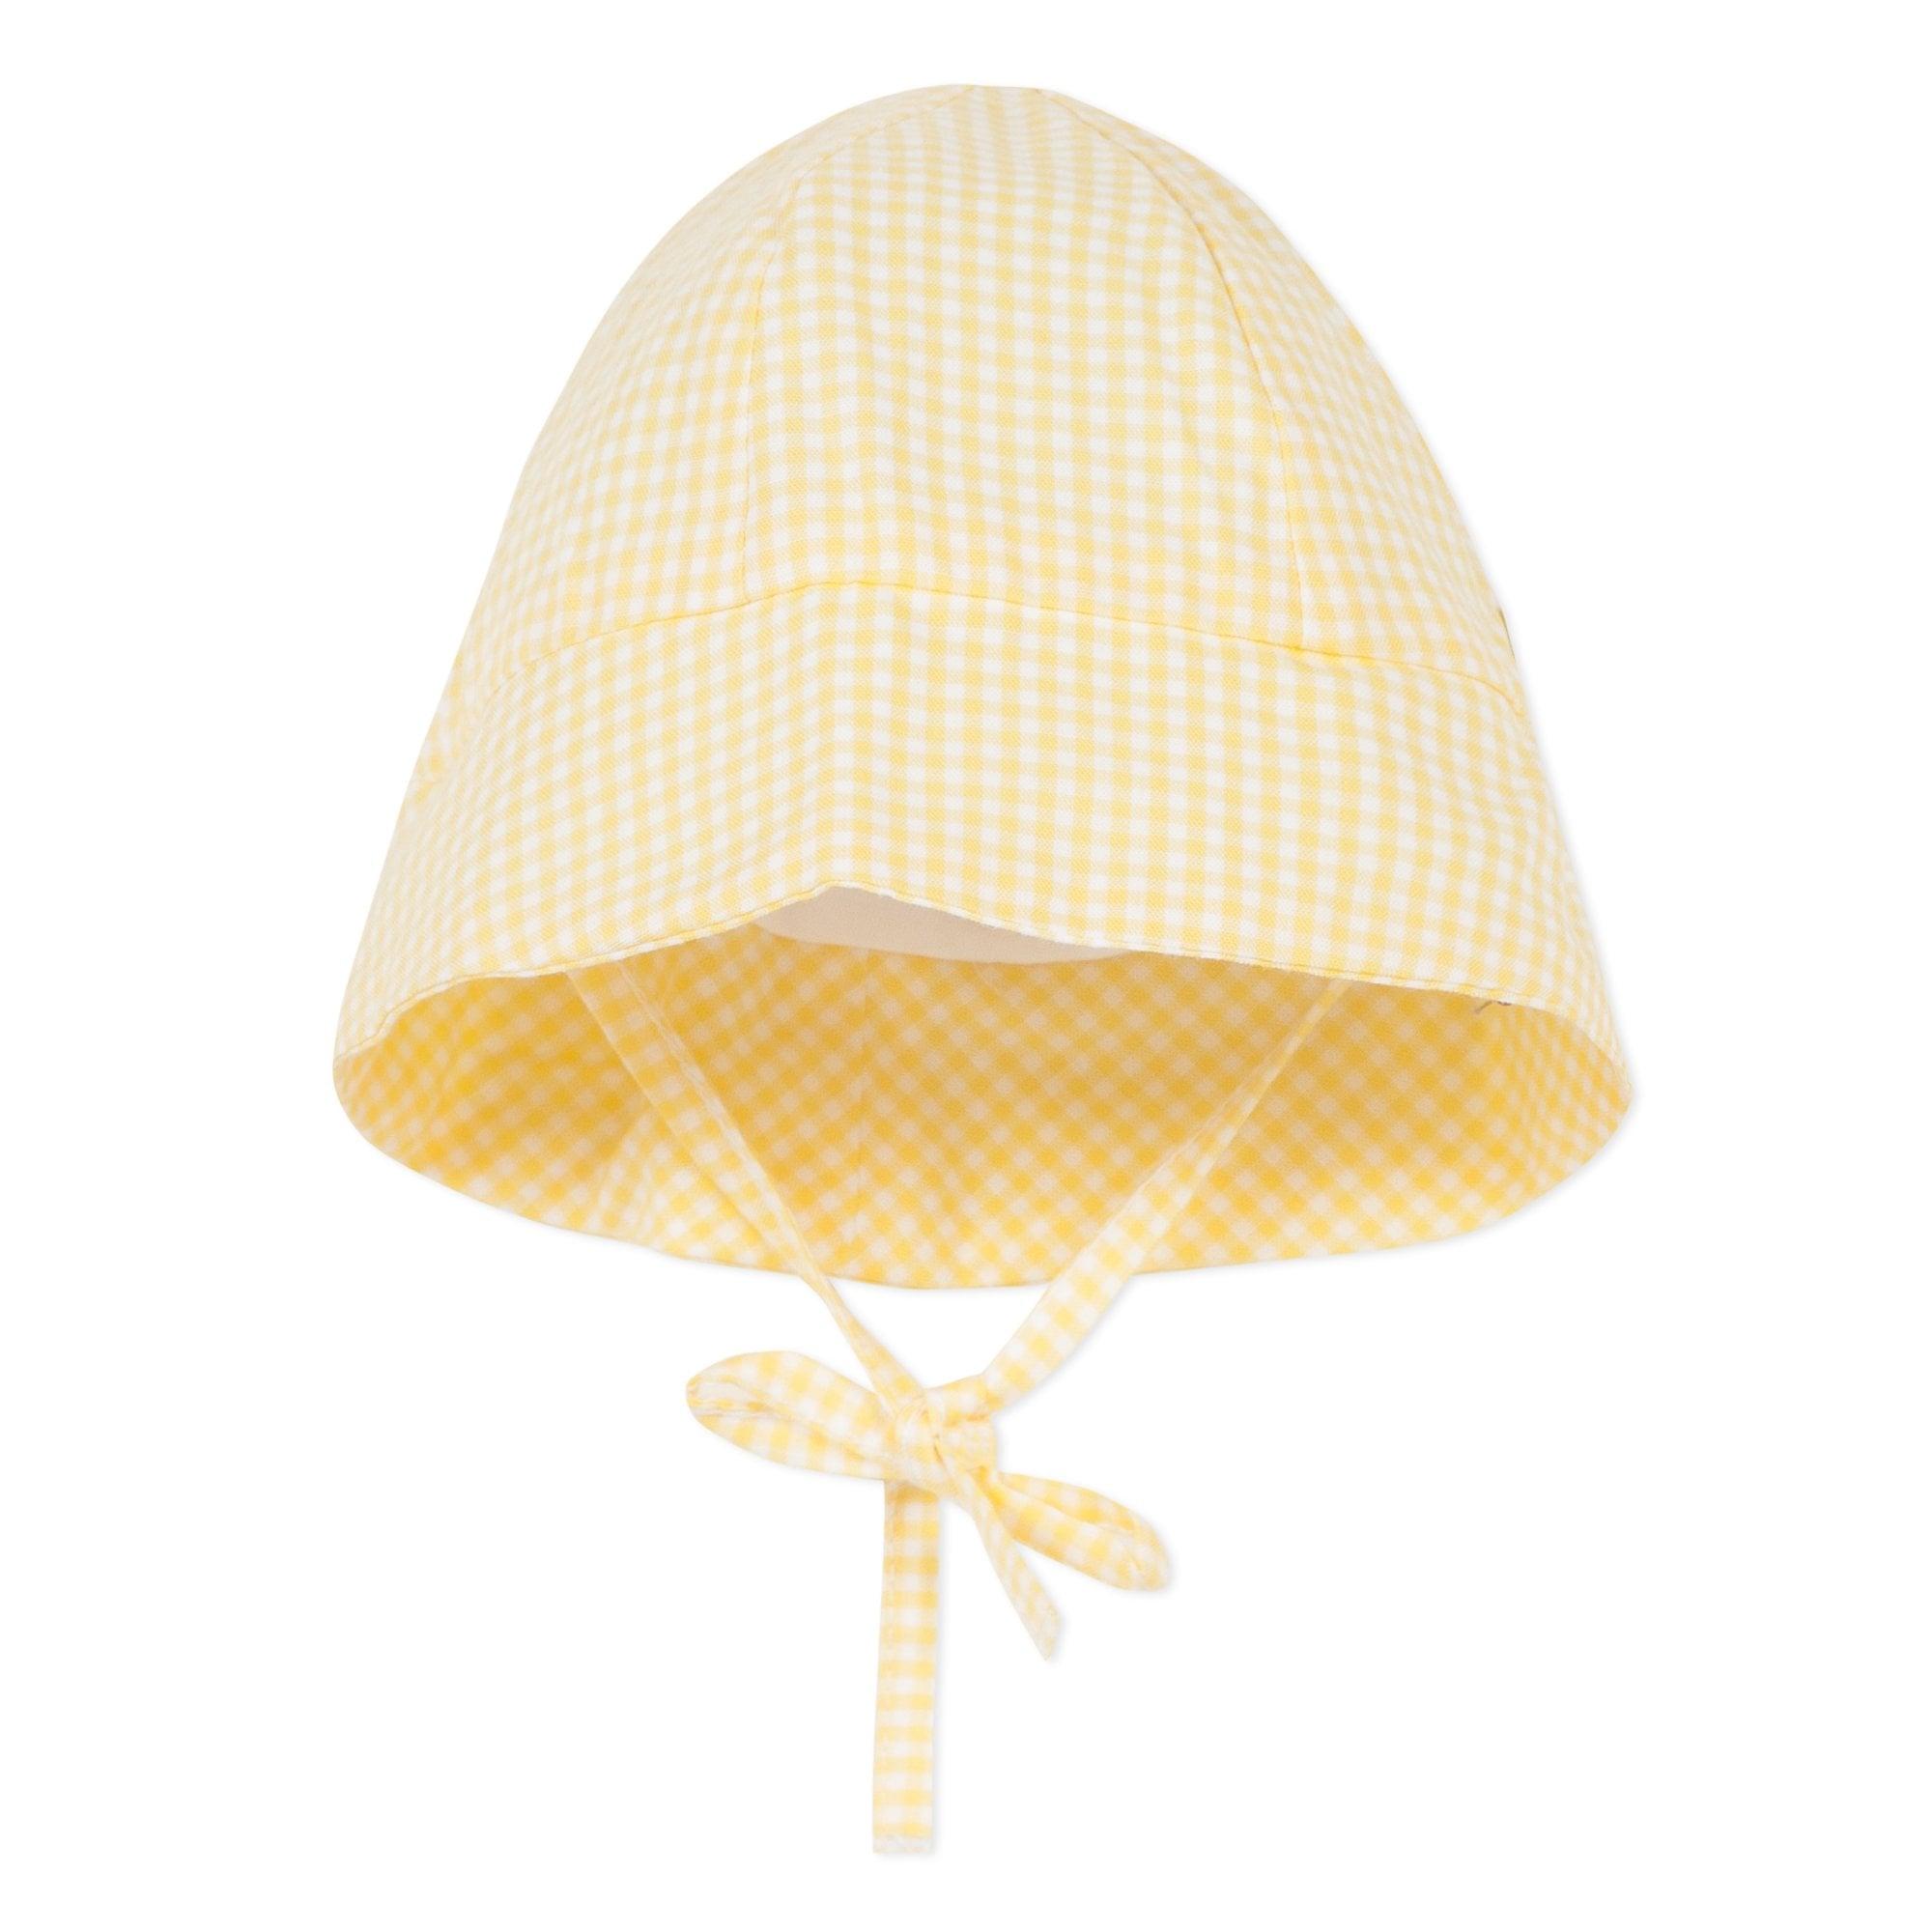 12-24 Months Sun Hat Baby Girl Pink Gingham Summer 100/% Cotton 6-12 Months